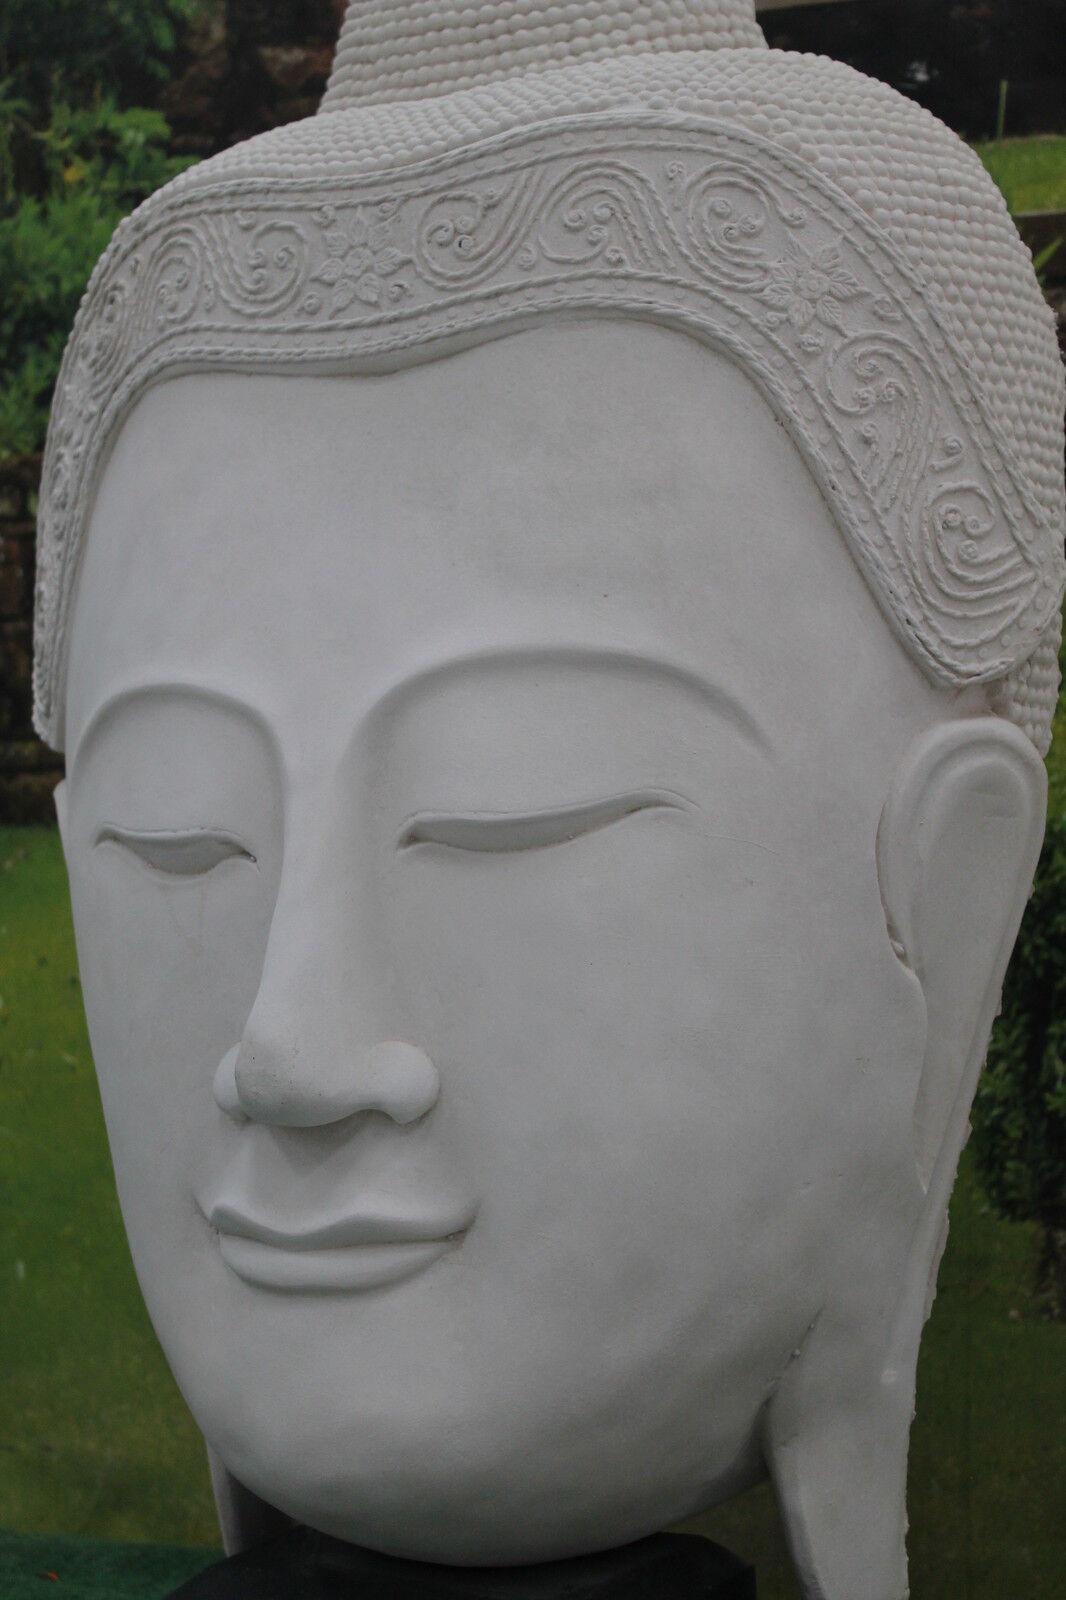 WHITE LIMESTONE 115 CMS TALL  BUDDHA STATUE  HEAD GARDEN ORNAMENT STATUE